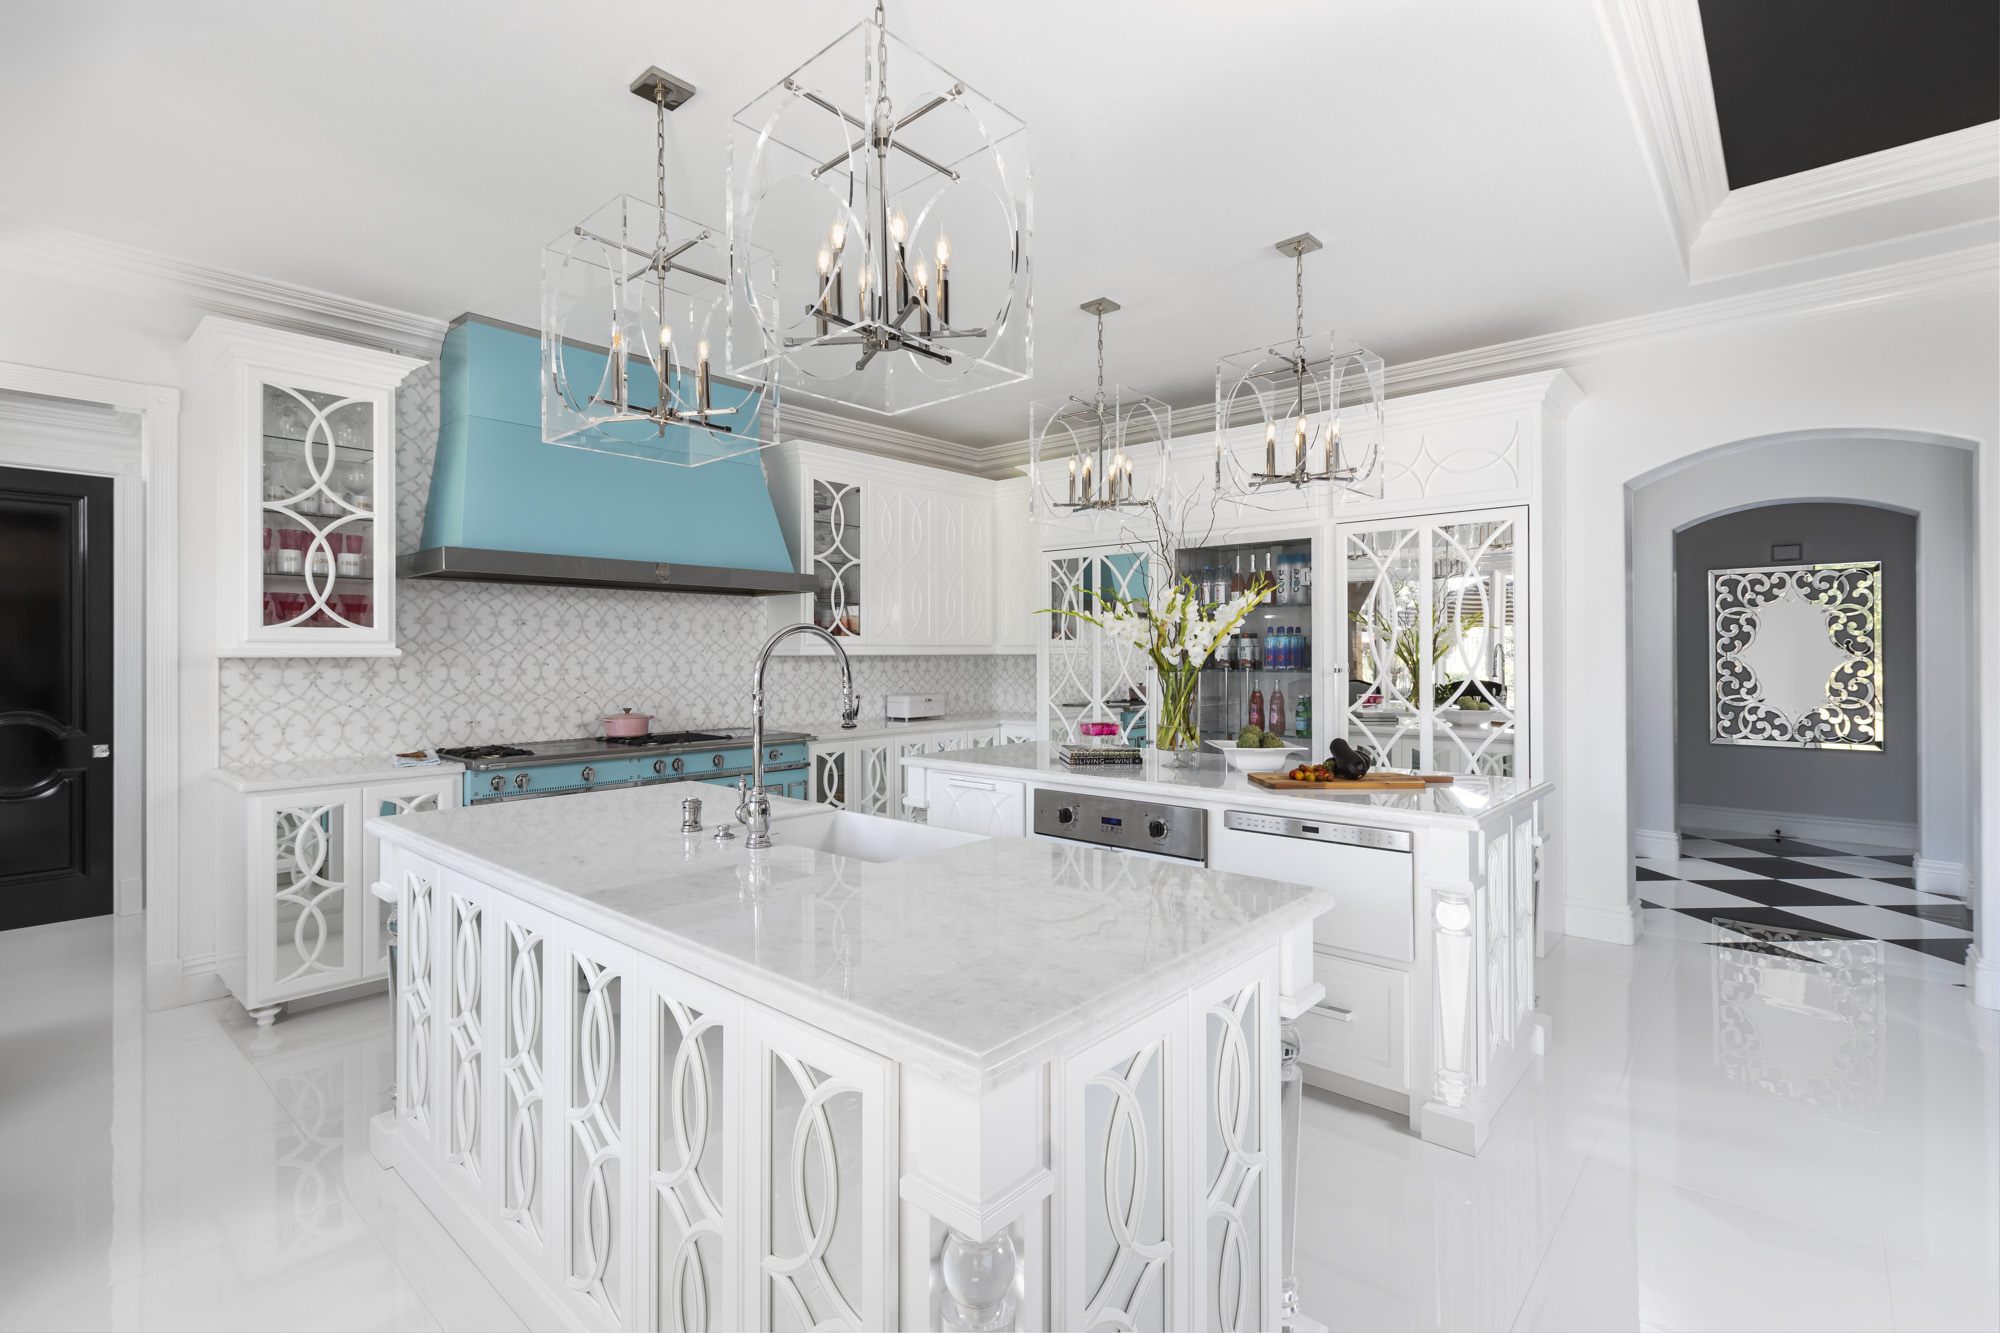 Coto de Caza Luxury Kitchen Remodel